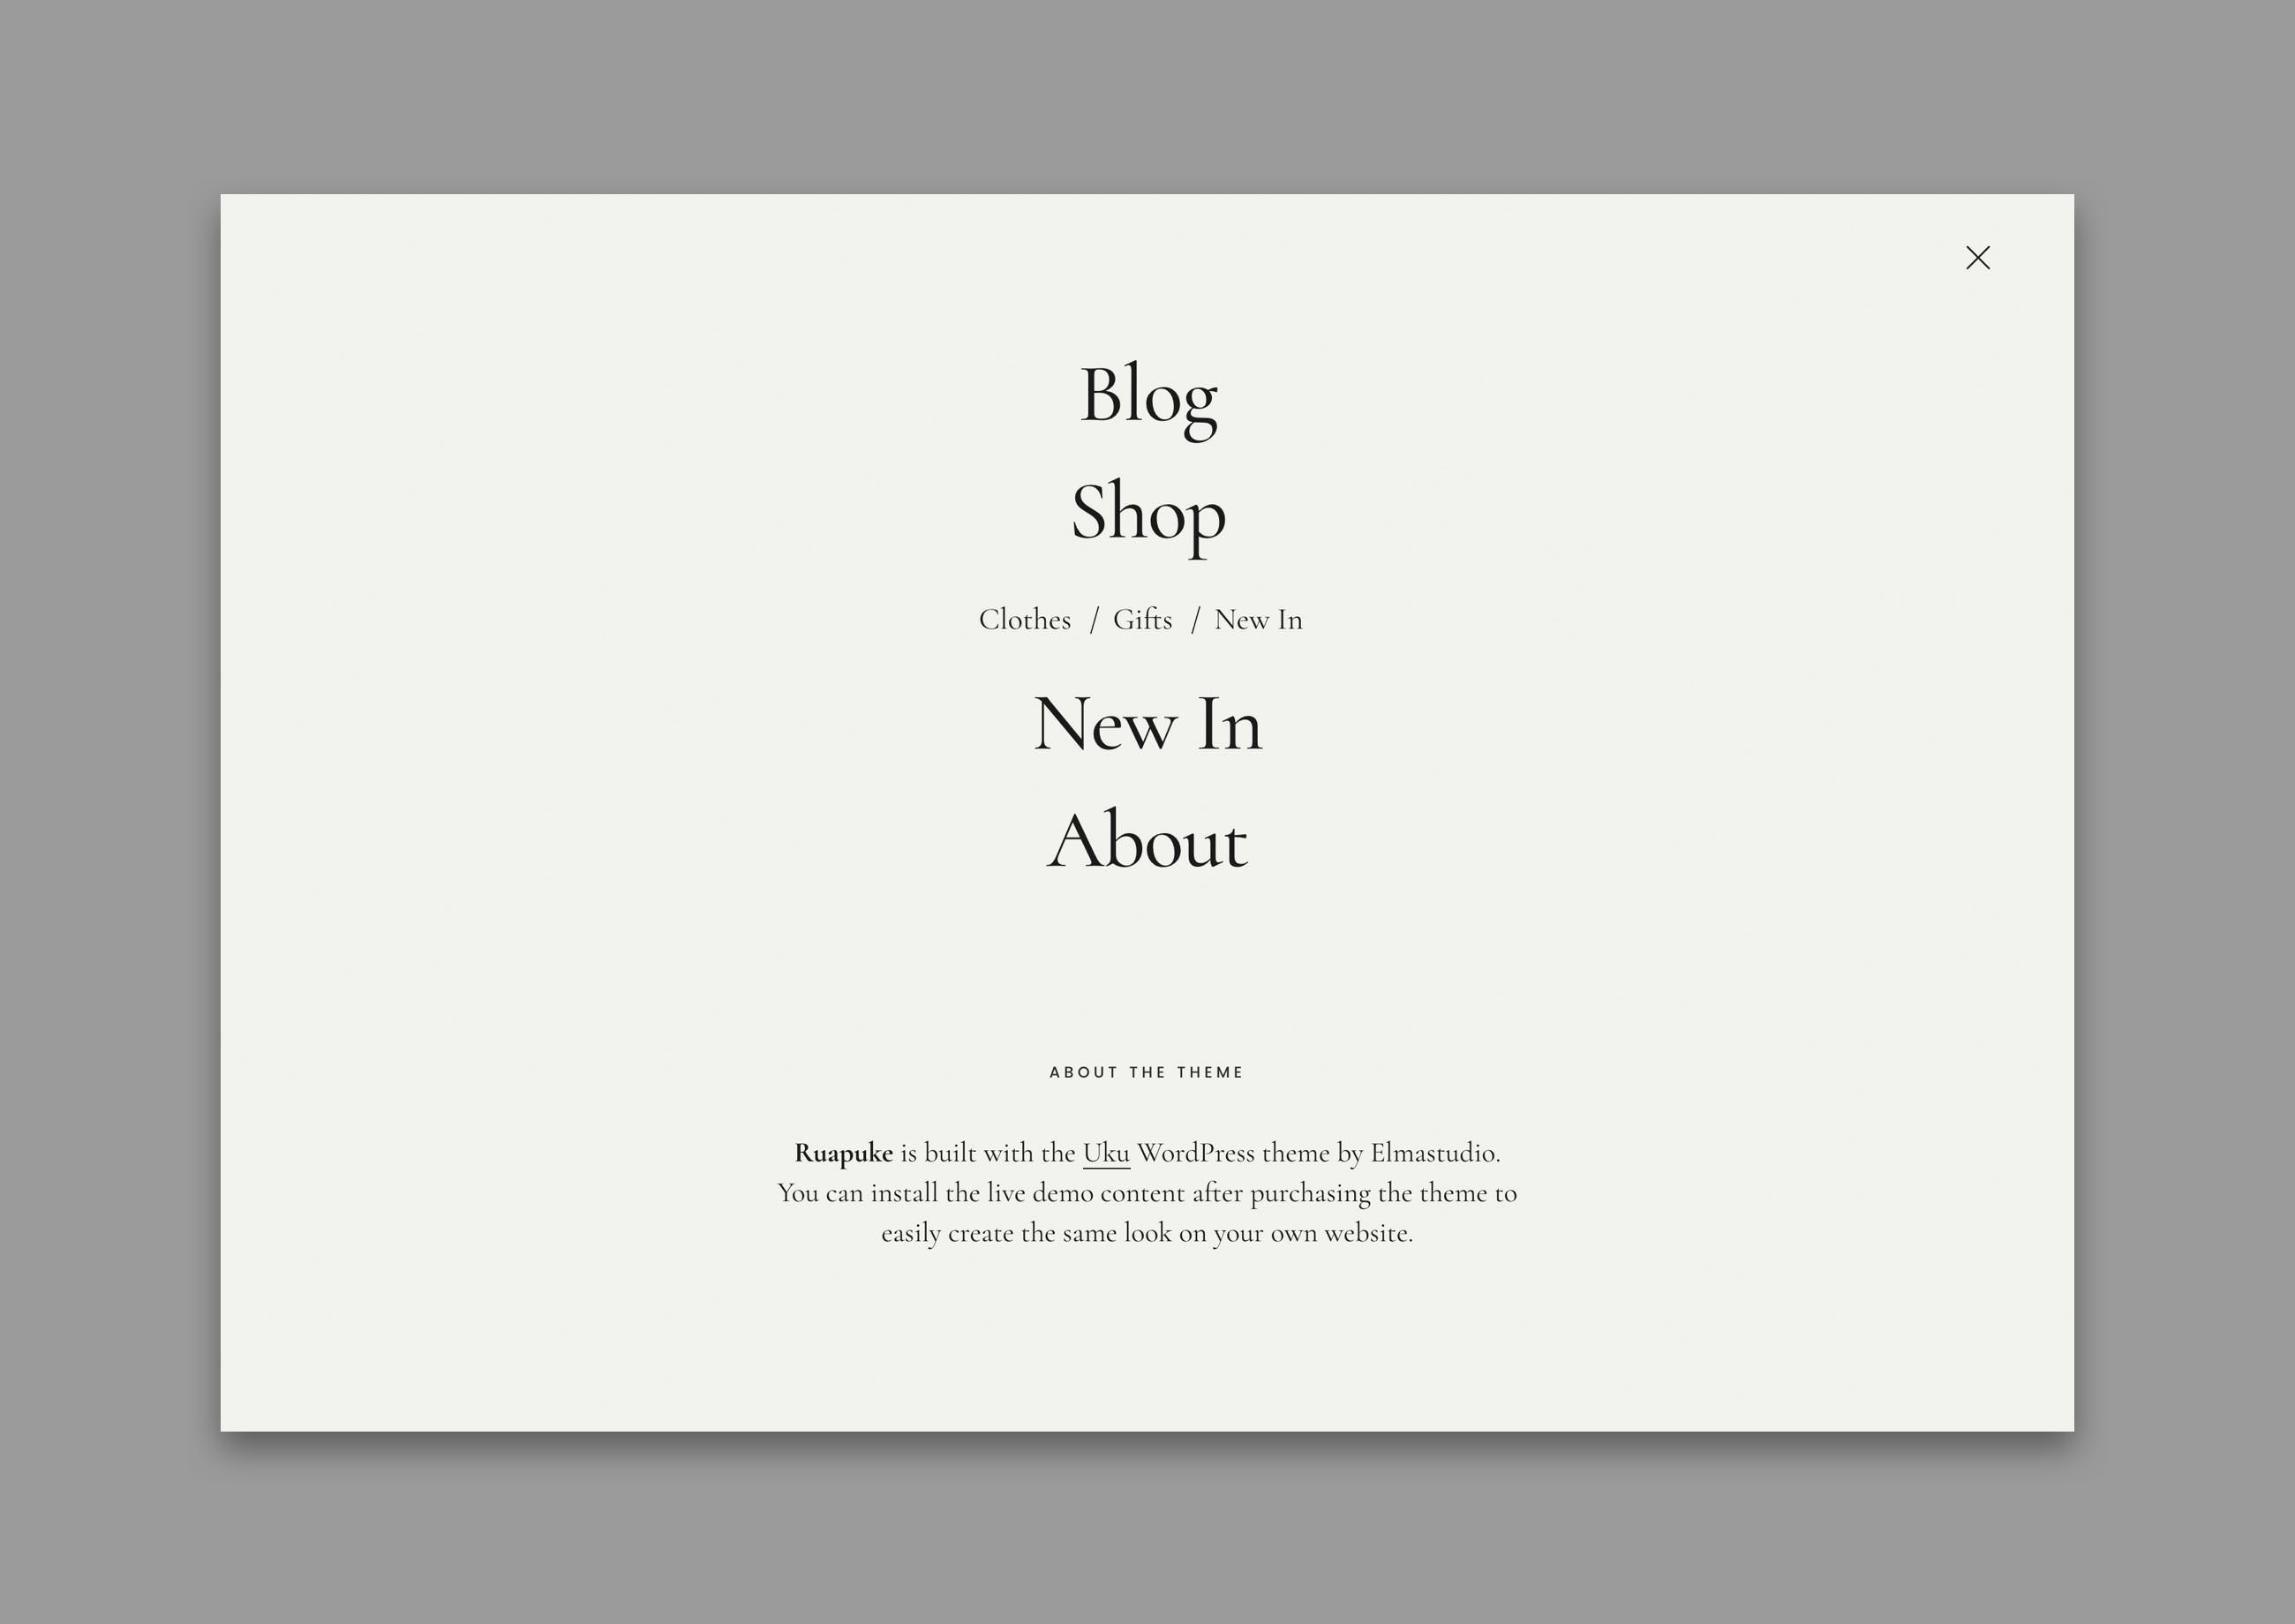 uku-wordpress-theme-woocommerce-update-overlay